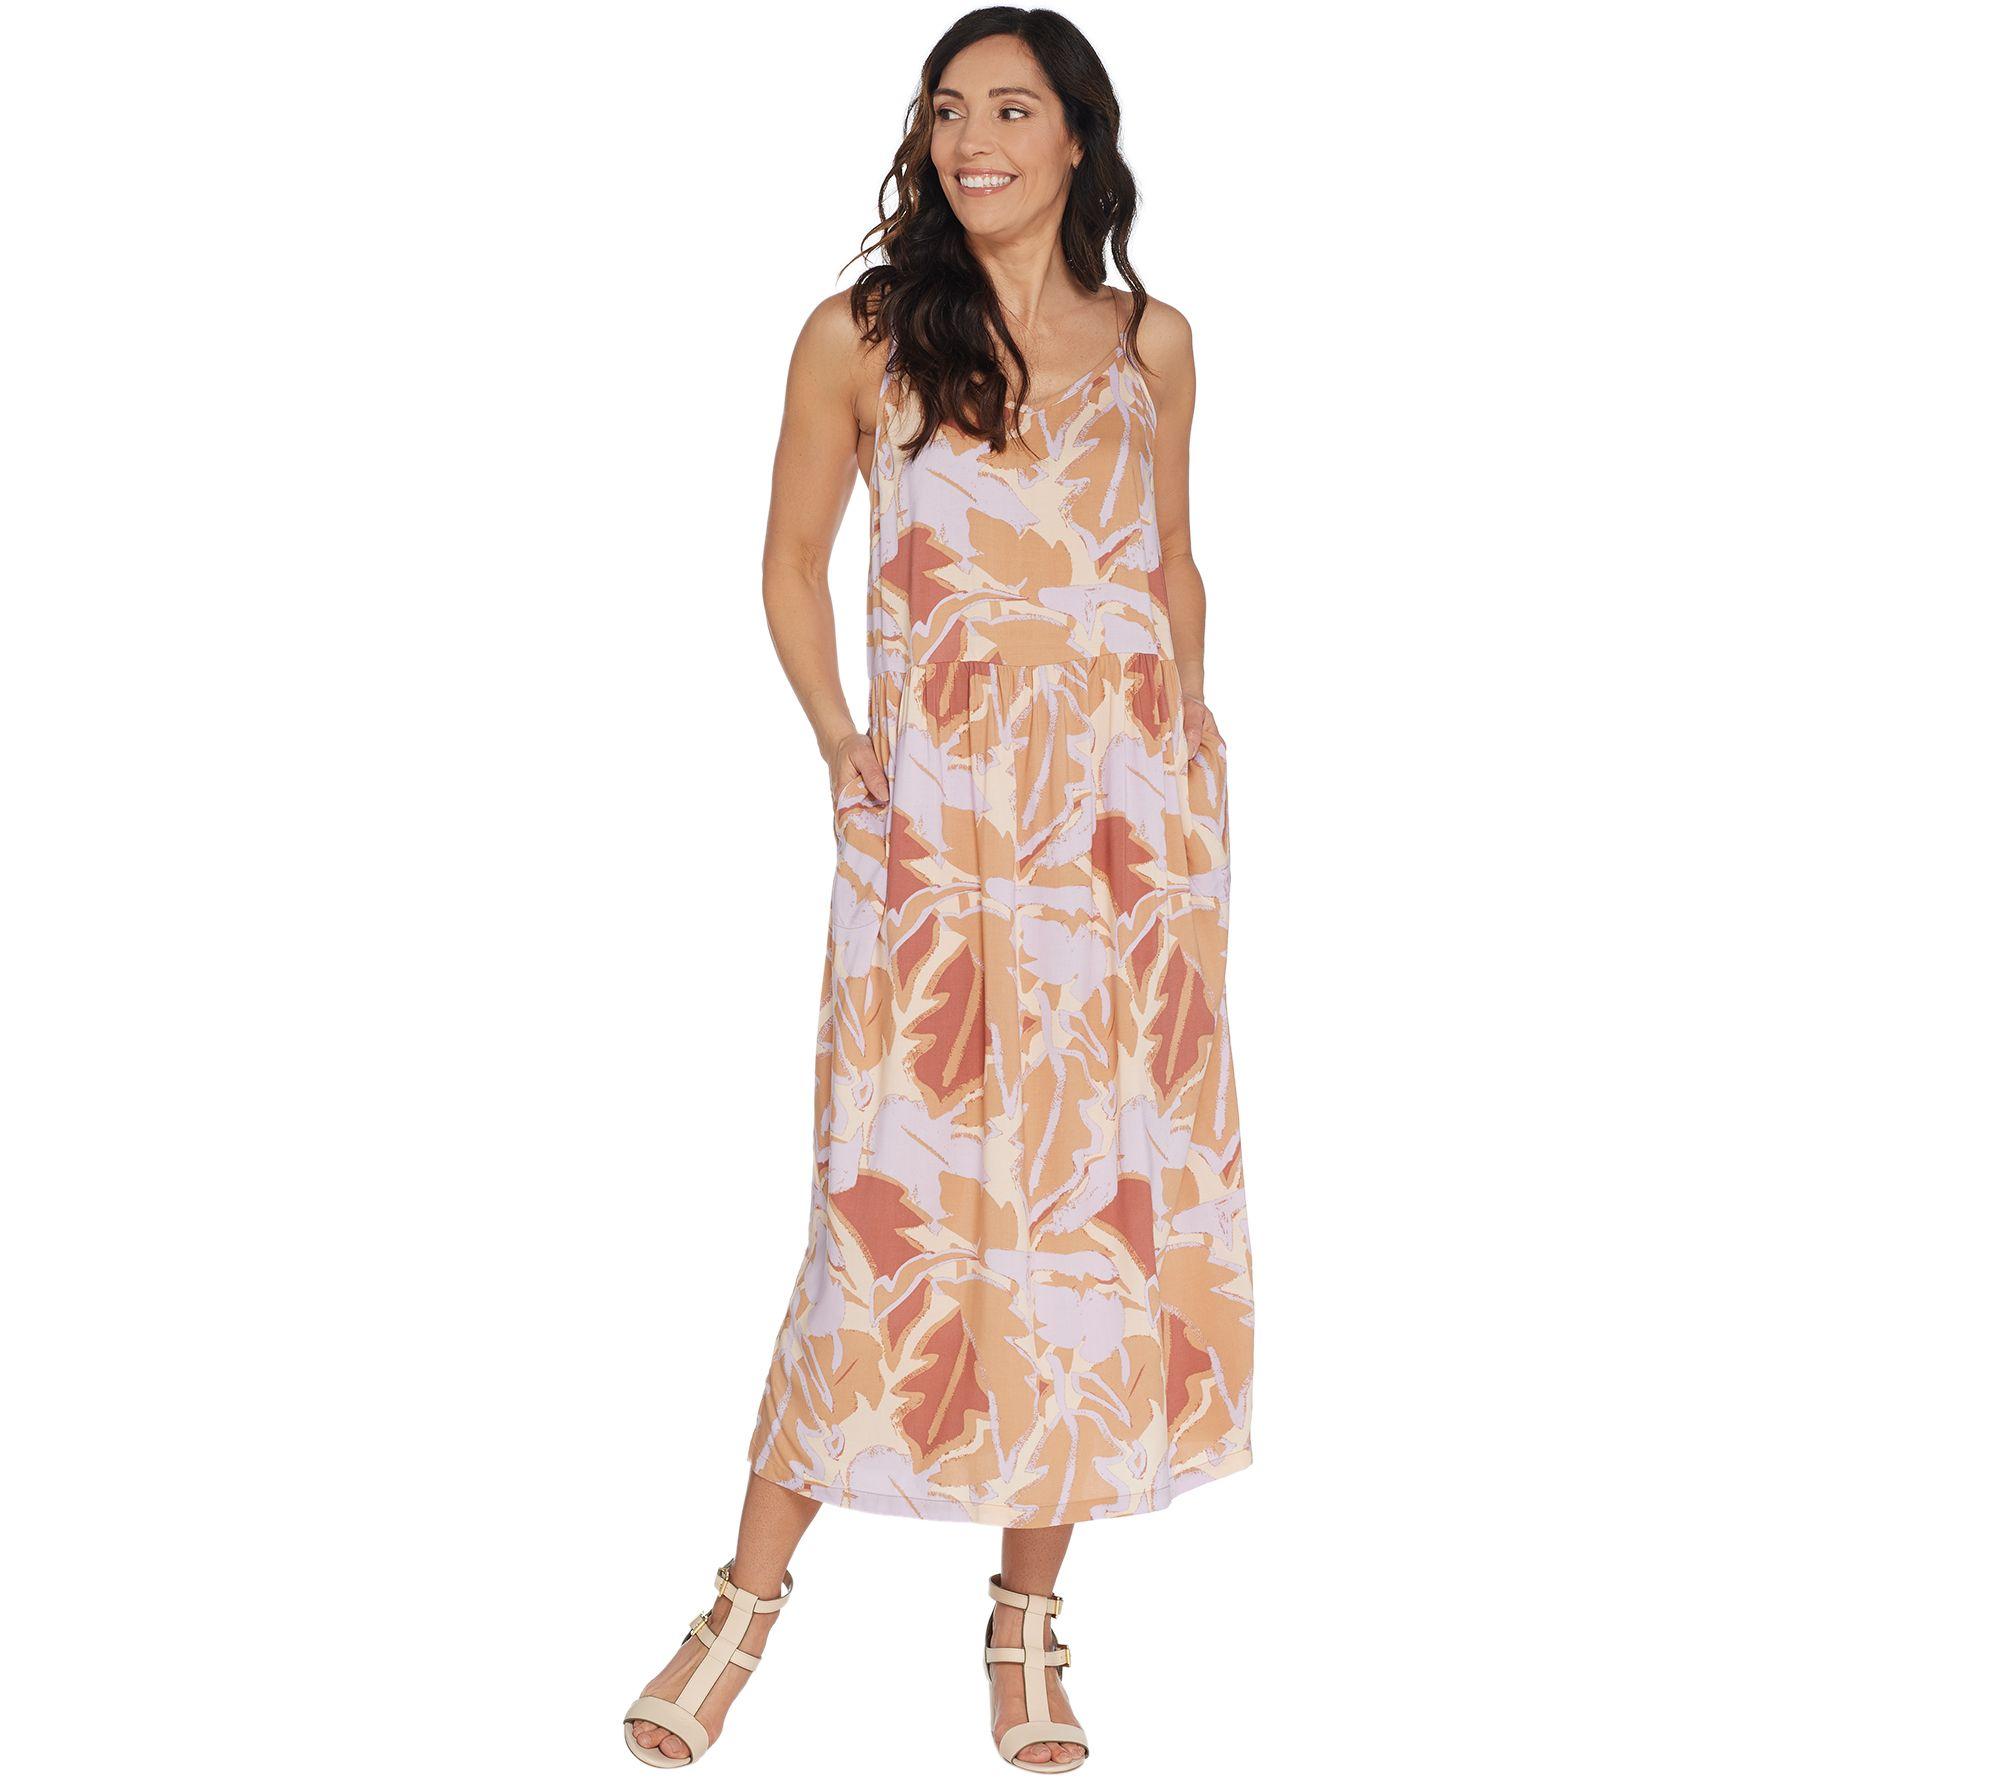 LOGO by Lori Goldstein Challis Printed Camisole Dress w/ Side Slits - A305480